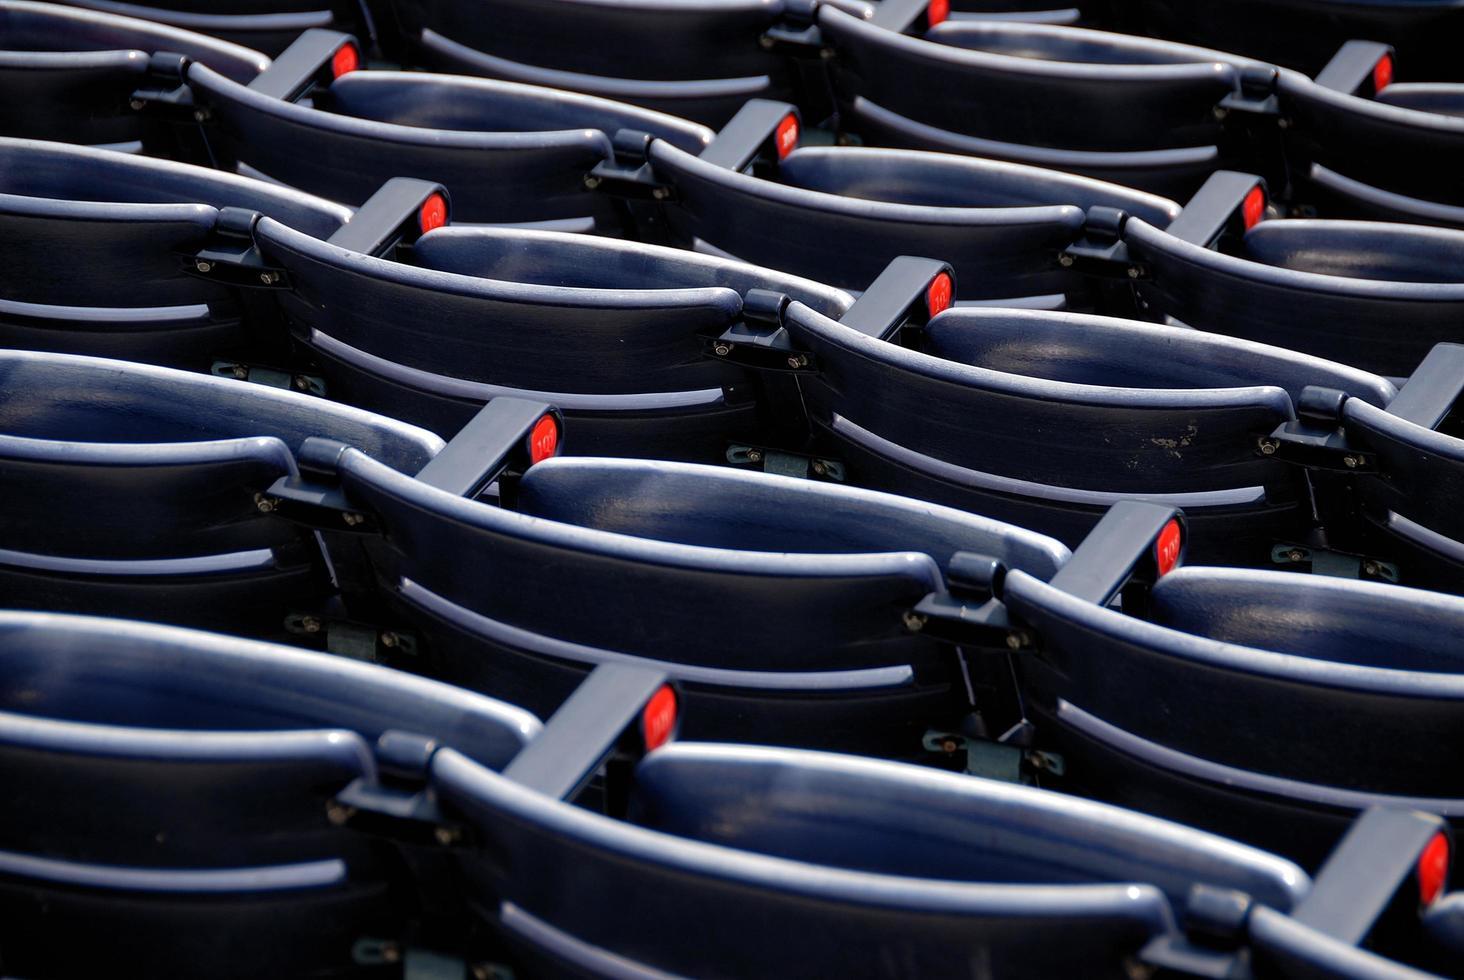 Empty seats in a stadium photo